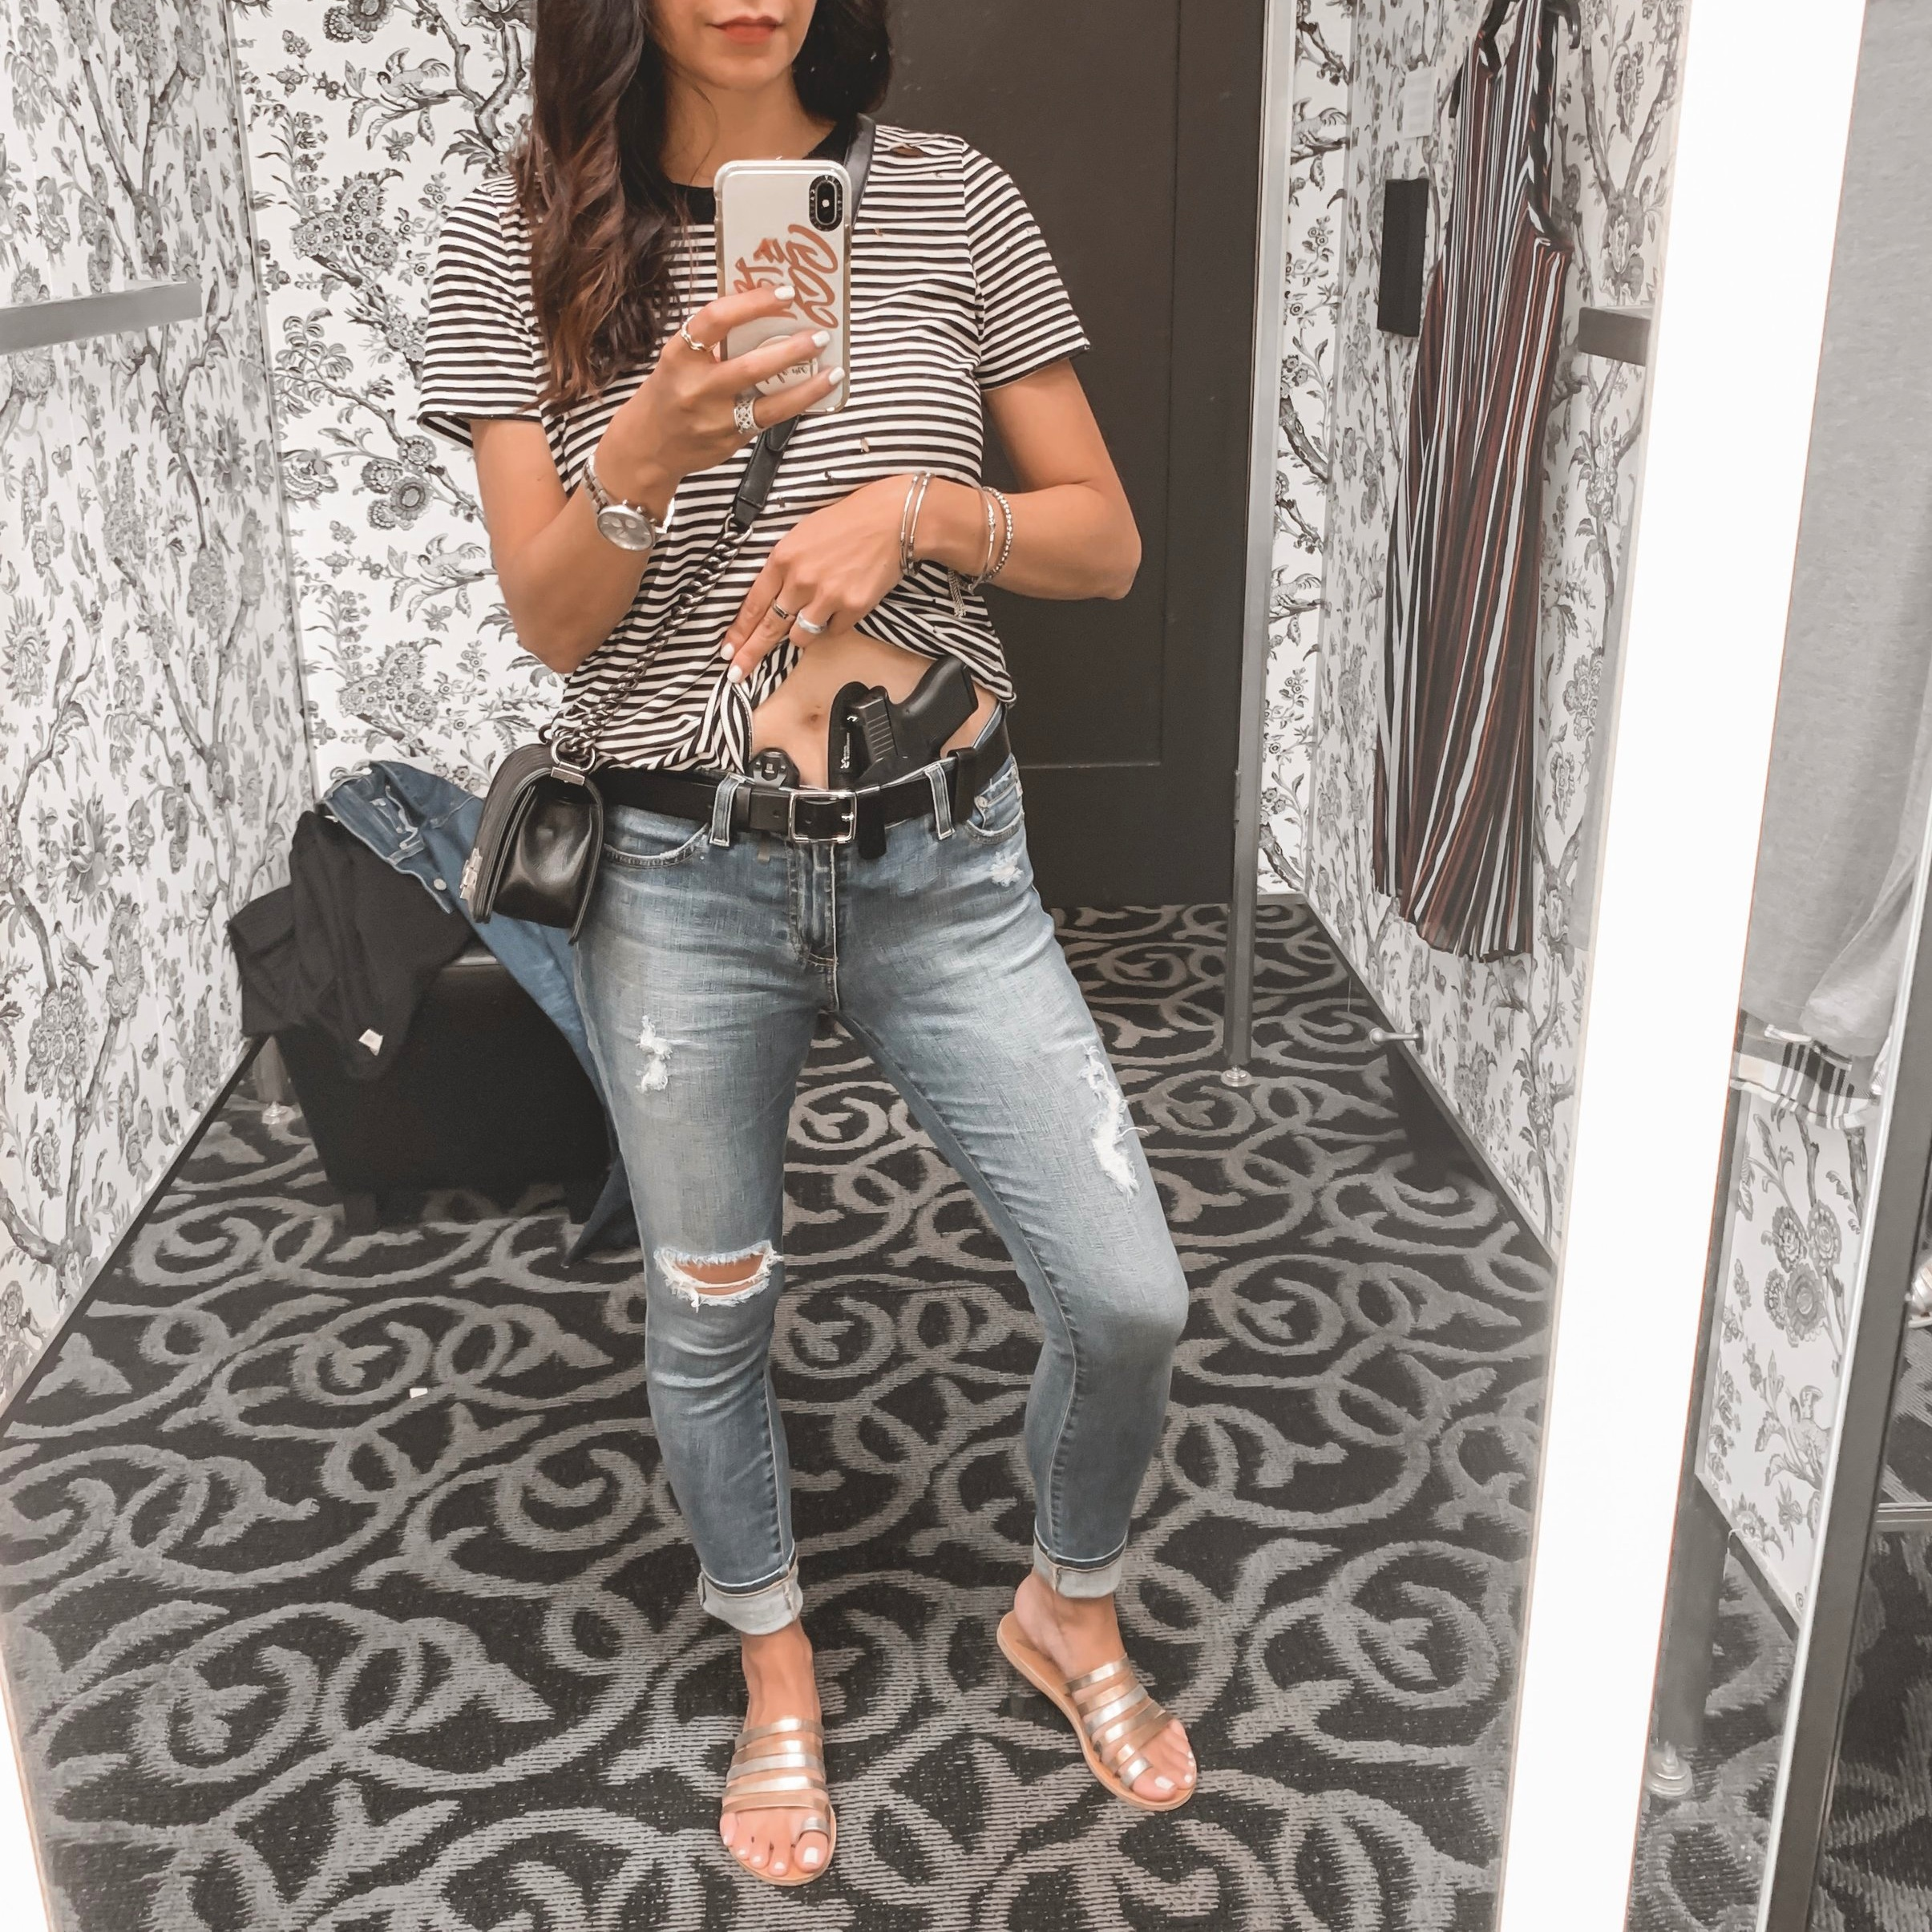 — Outfit Details — n:Philanthropy Shirt  {   similar   }    AG Jeans  {   similar   }    Ancient Greek Sandals  { similar }    Chanel Handbag    — Concealed Carry Details —  Self-Defense Tool:  Glock 43    Holster:   StealthGearUSA Ventcore AIWB  *   Flashlight:   SureFire Stiletto     Belt:   Rag and Bone   (*use code SMT10 for 10% off at   stealthgearusa.com  )